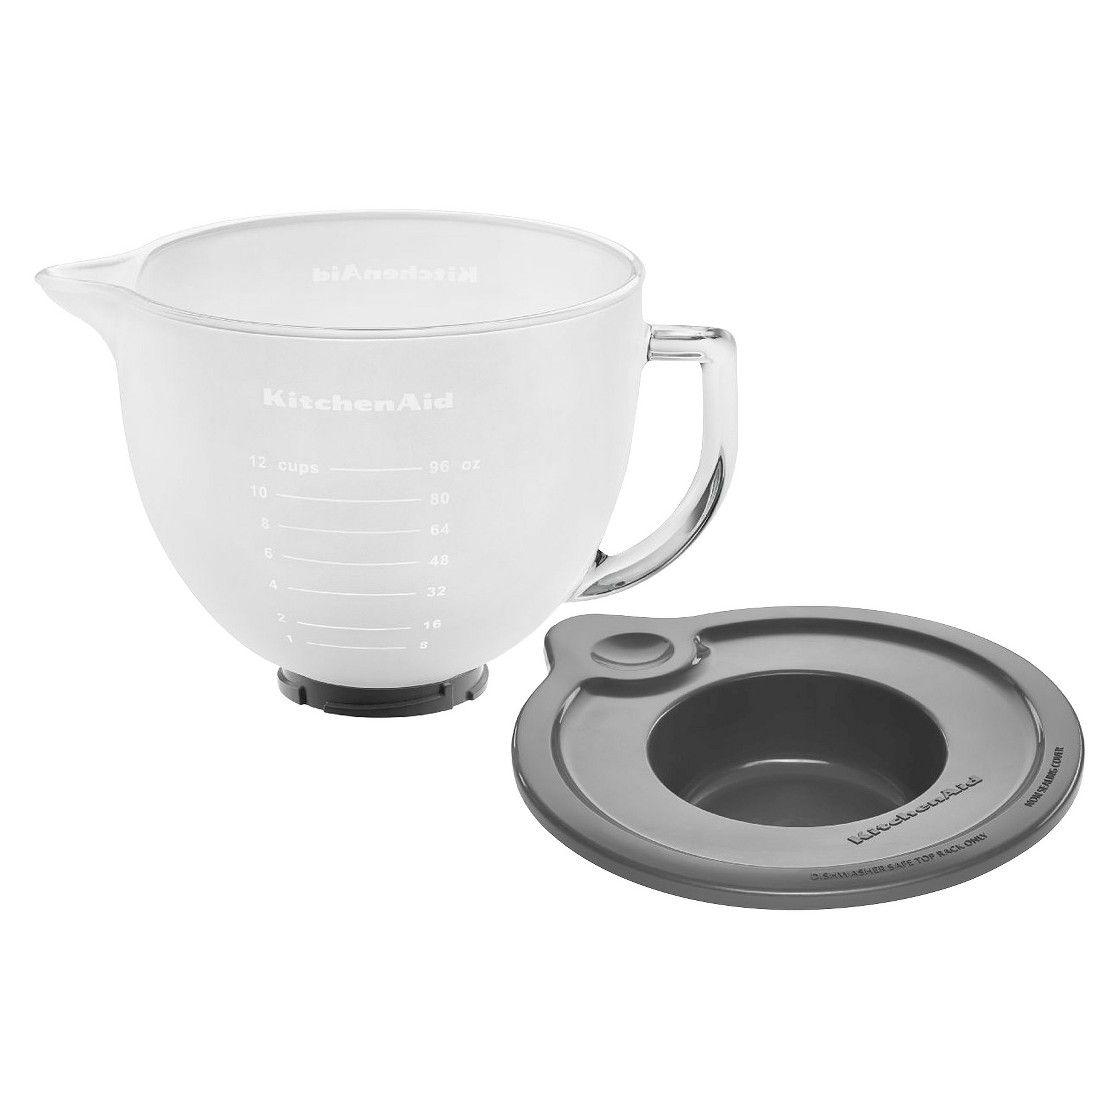 Kitchenaid frosted glass 5 qt mixing bowl mixer